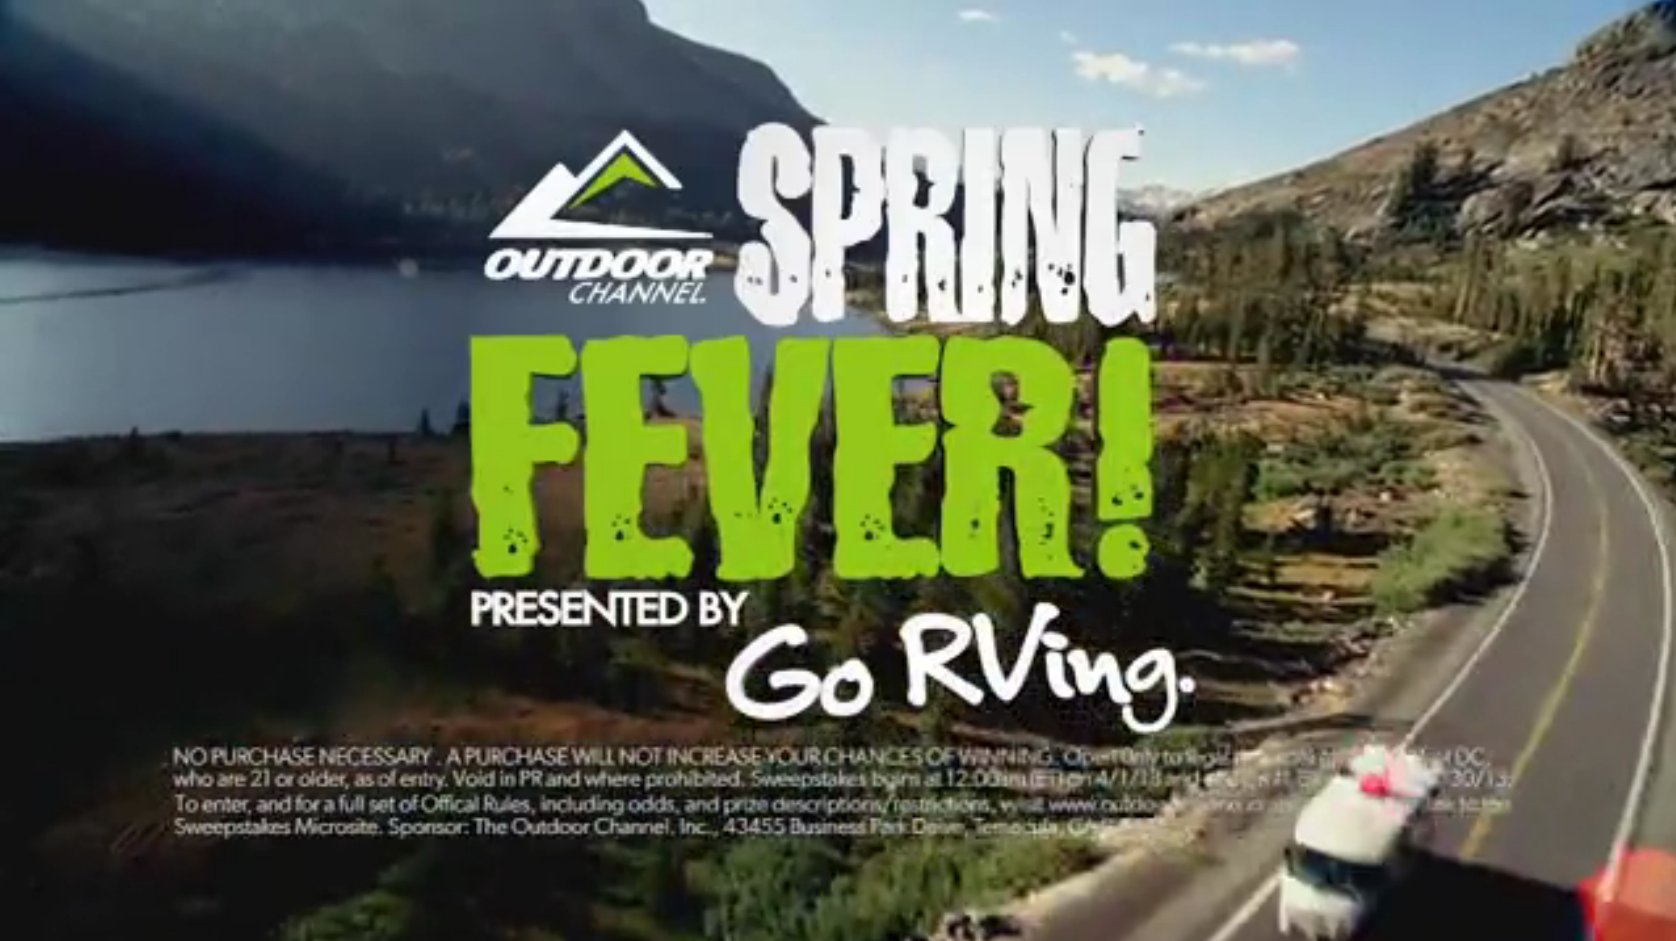 Spring Fever 2013